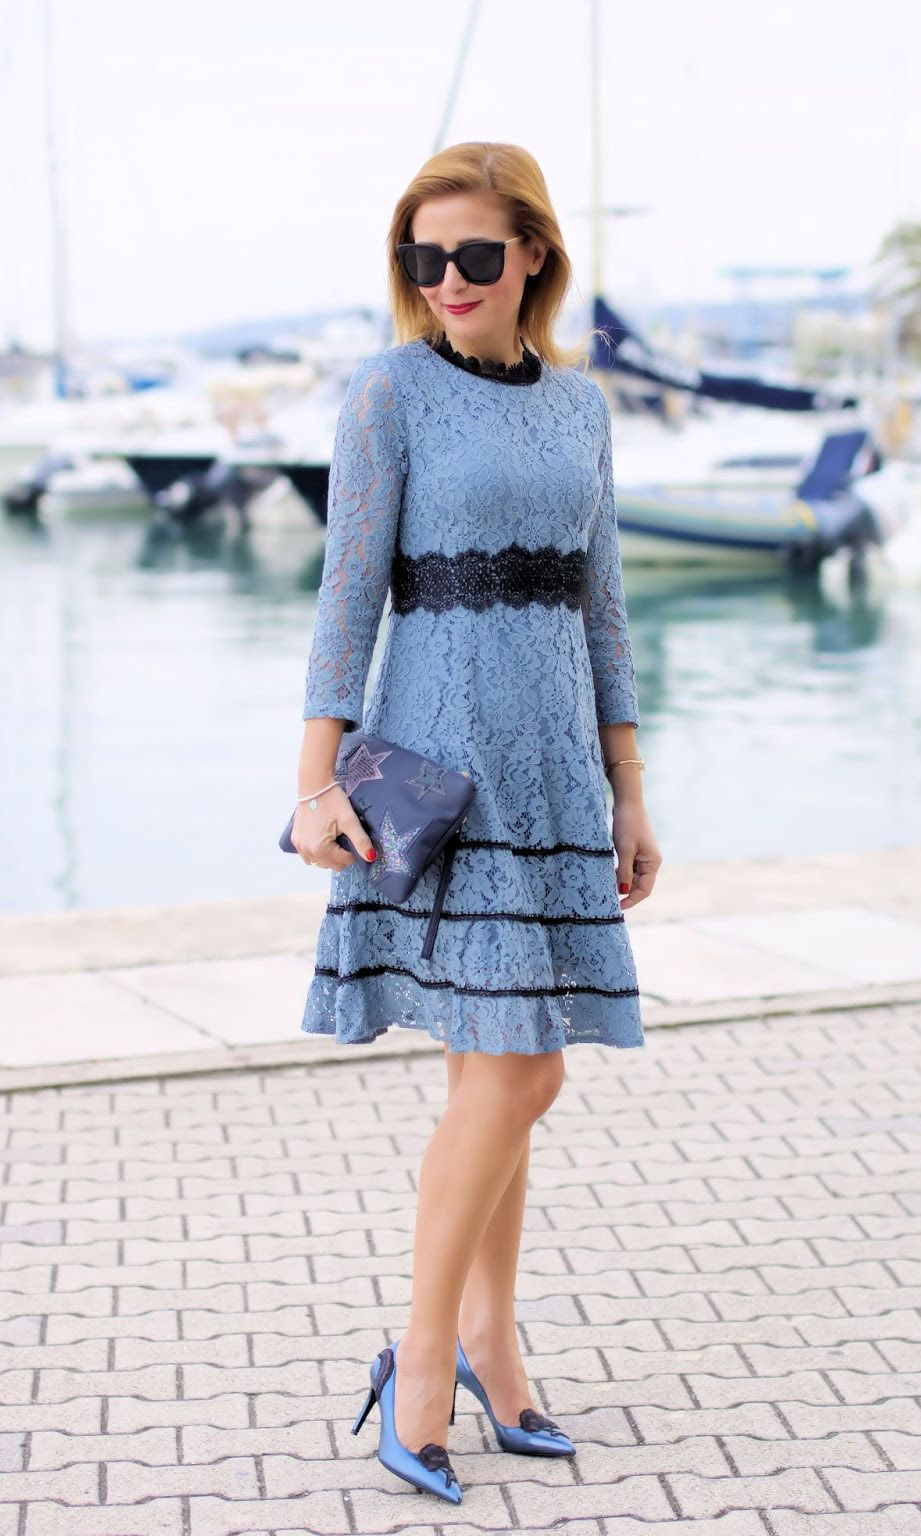 f69812b33e Blue Hollow Out Lace Swing Midi Dress